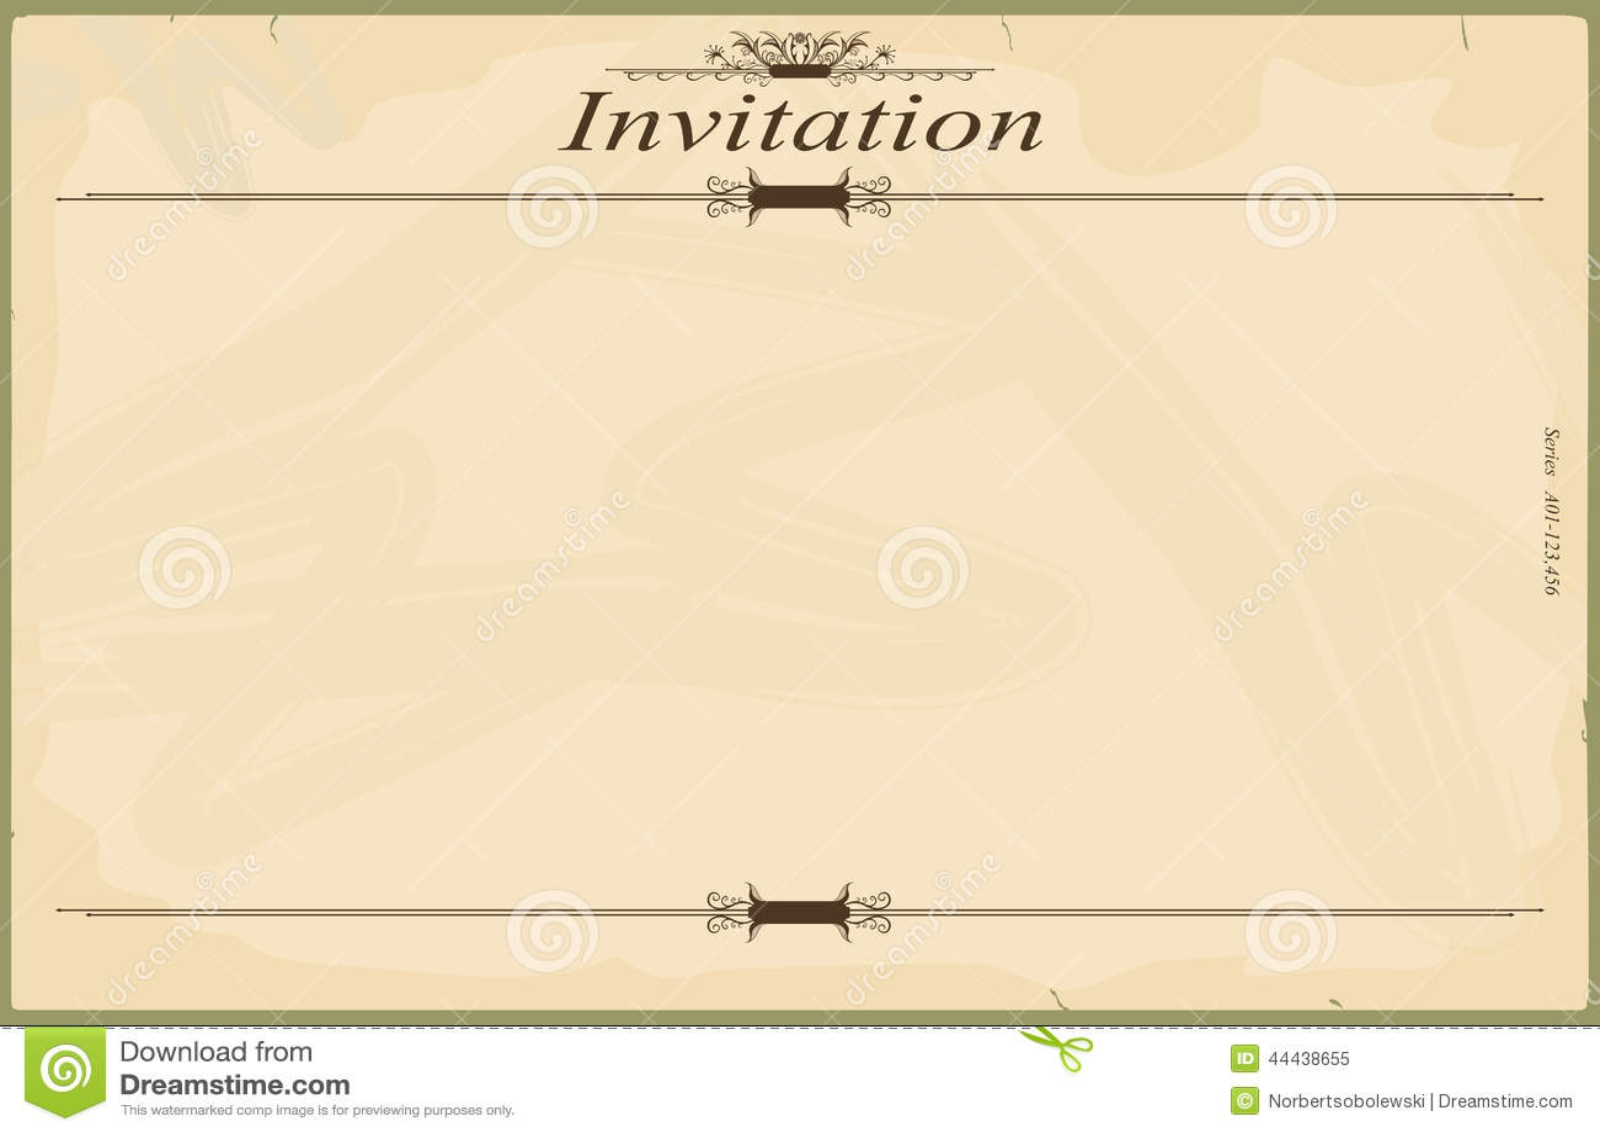 Invitation stock vector. Illustration of birthday ...